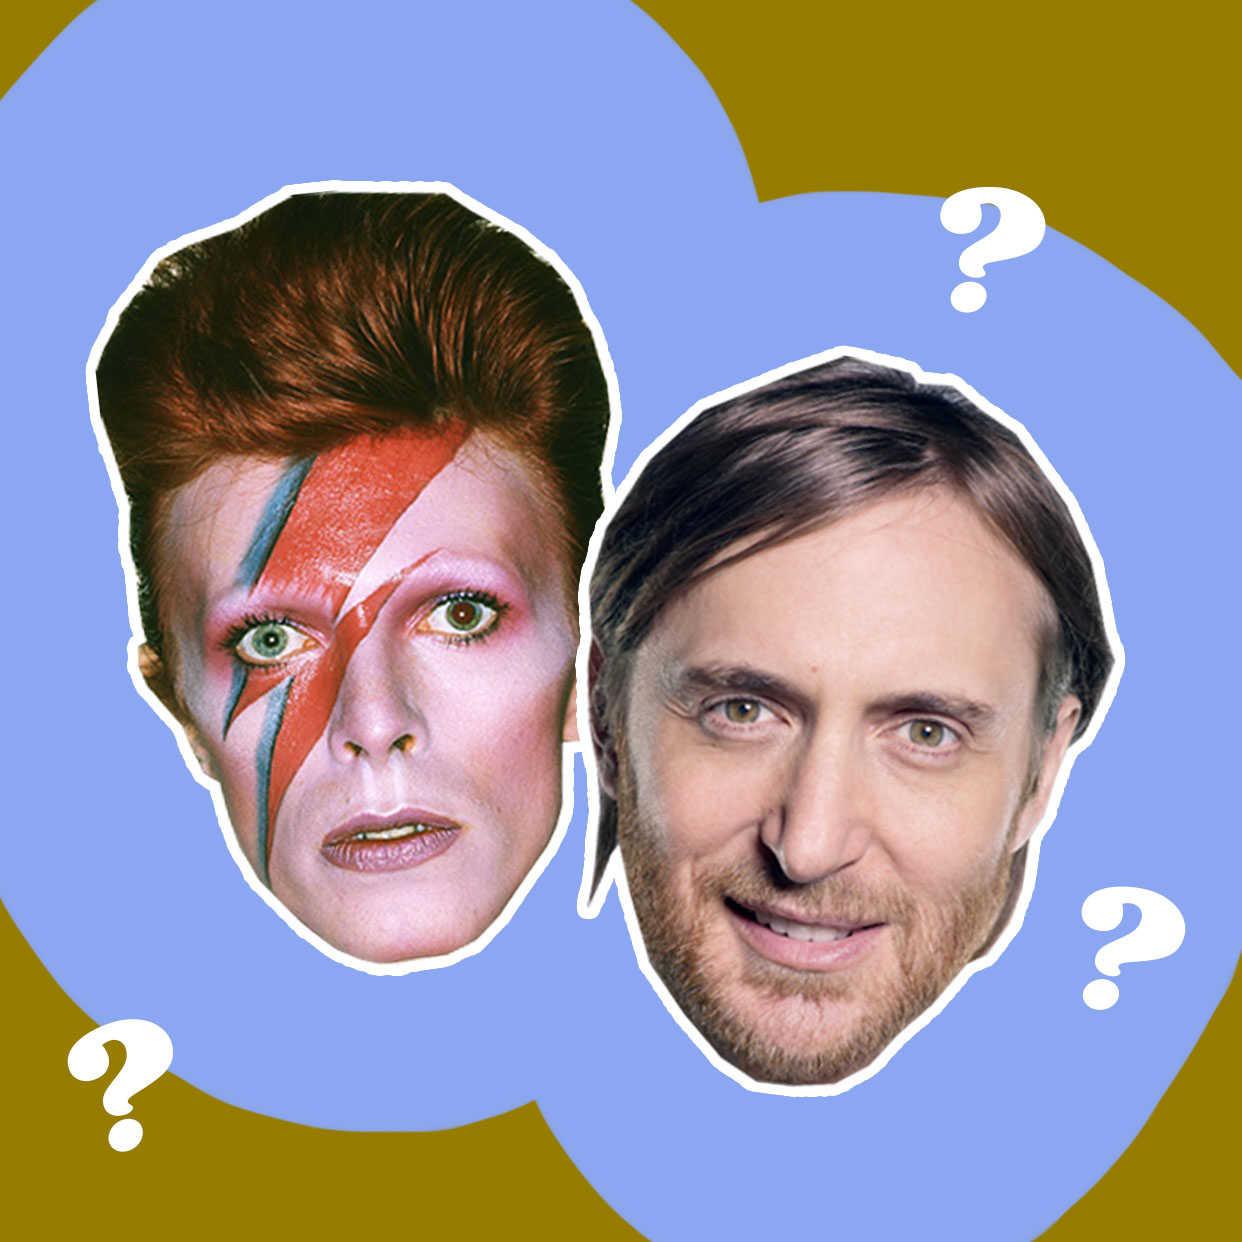 David Bowie ou David Guetta : qui a dit quoi ?